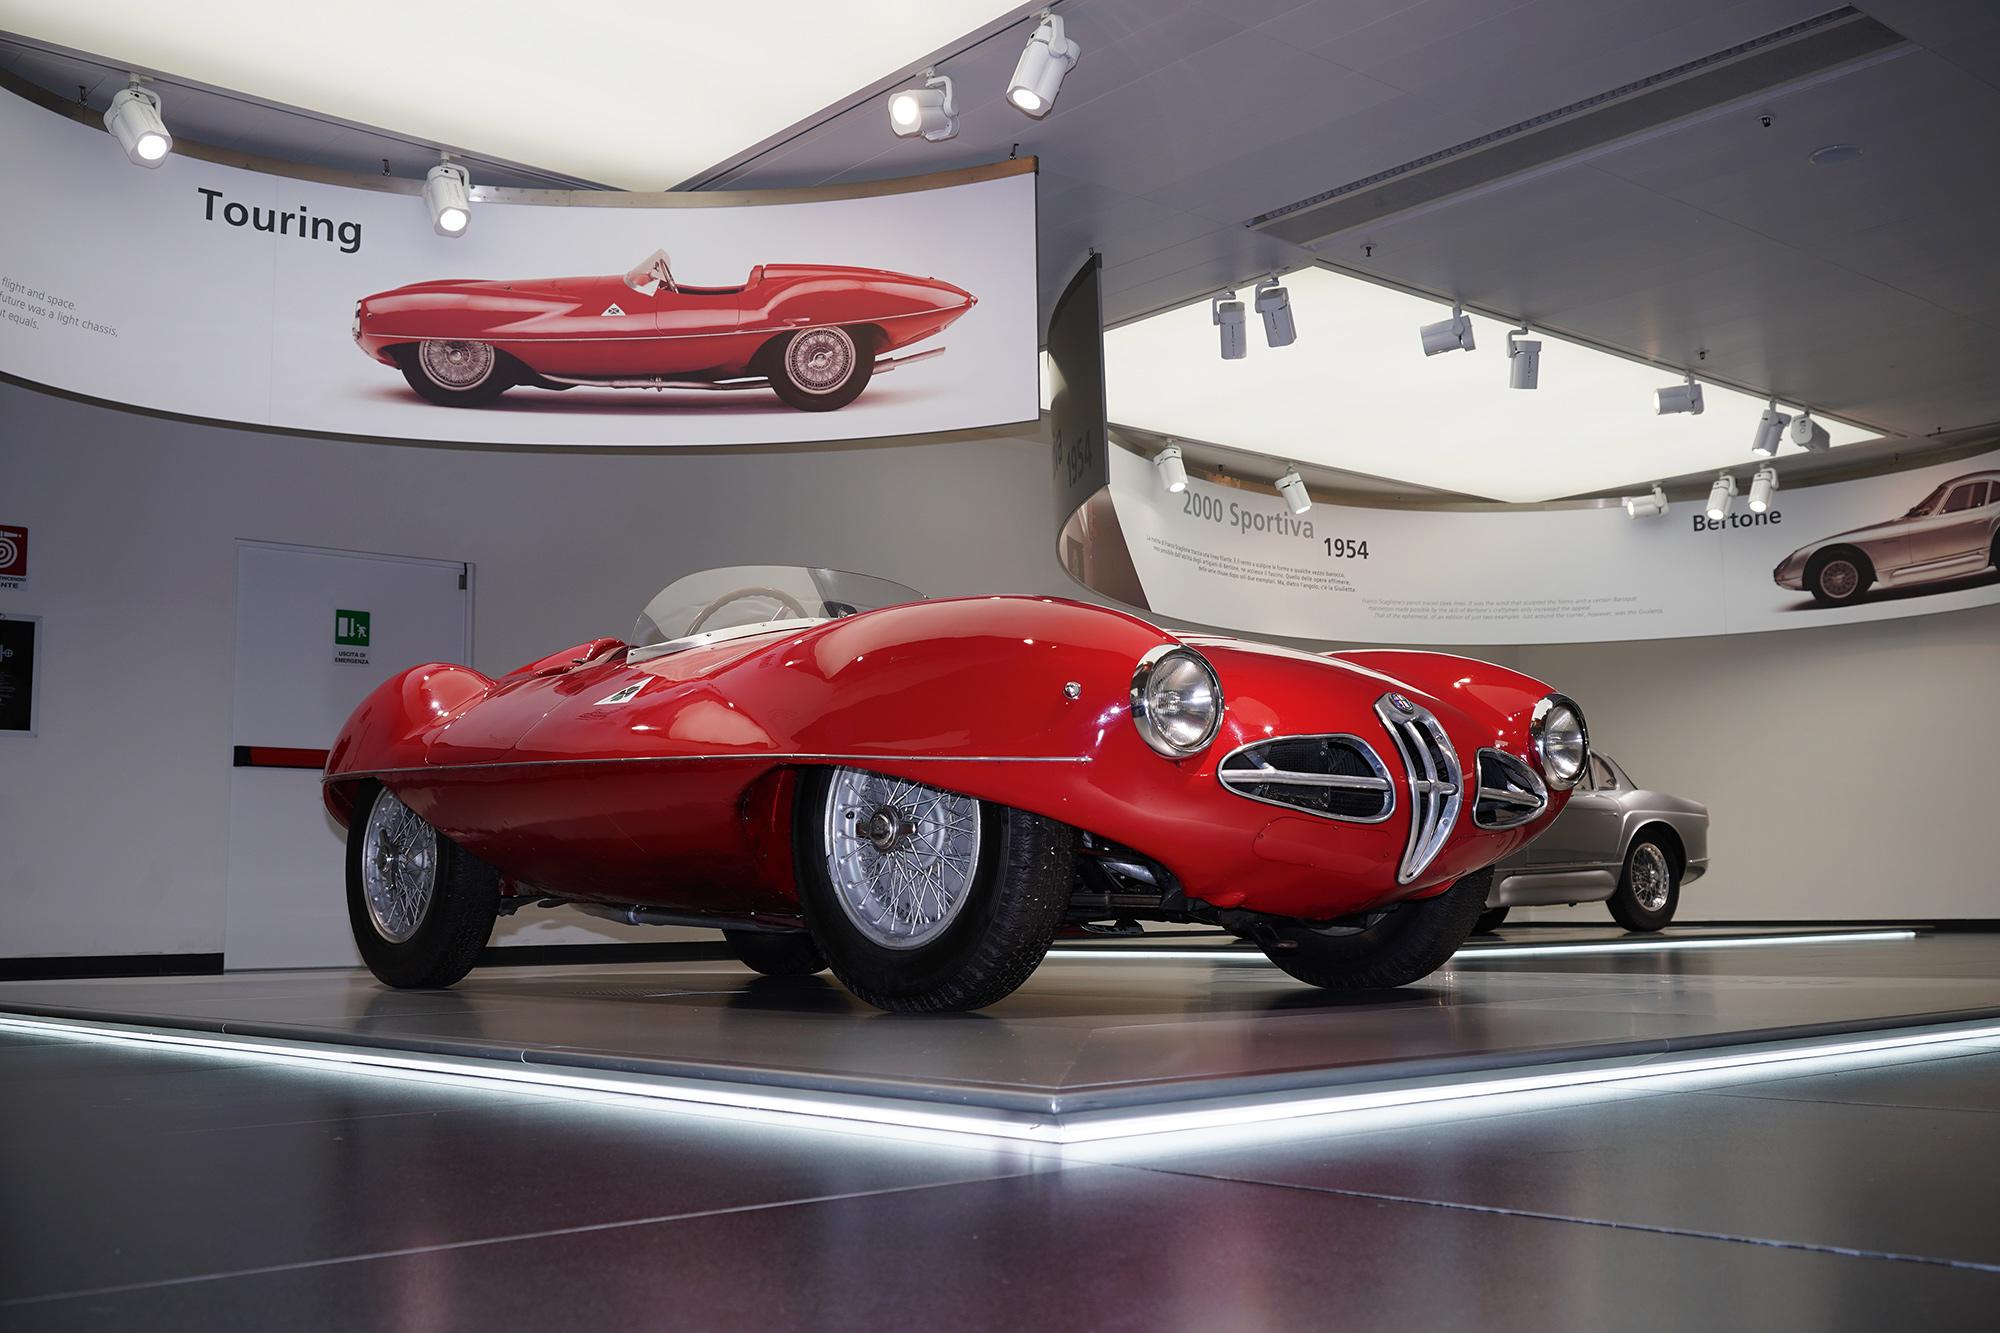 Octane Edition 05 Alfa Romeo - Museo Storico Alfa Romeo in Arese